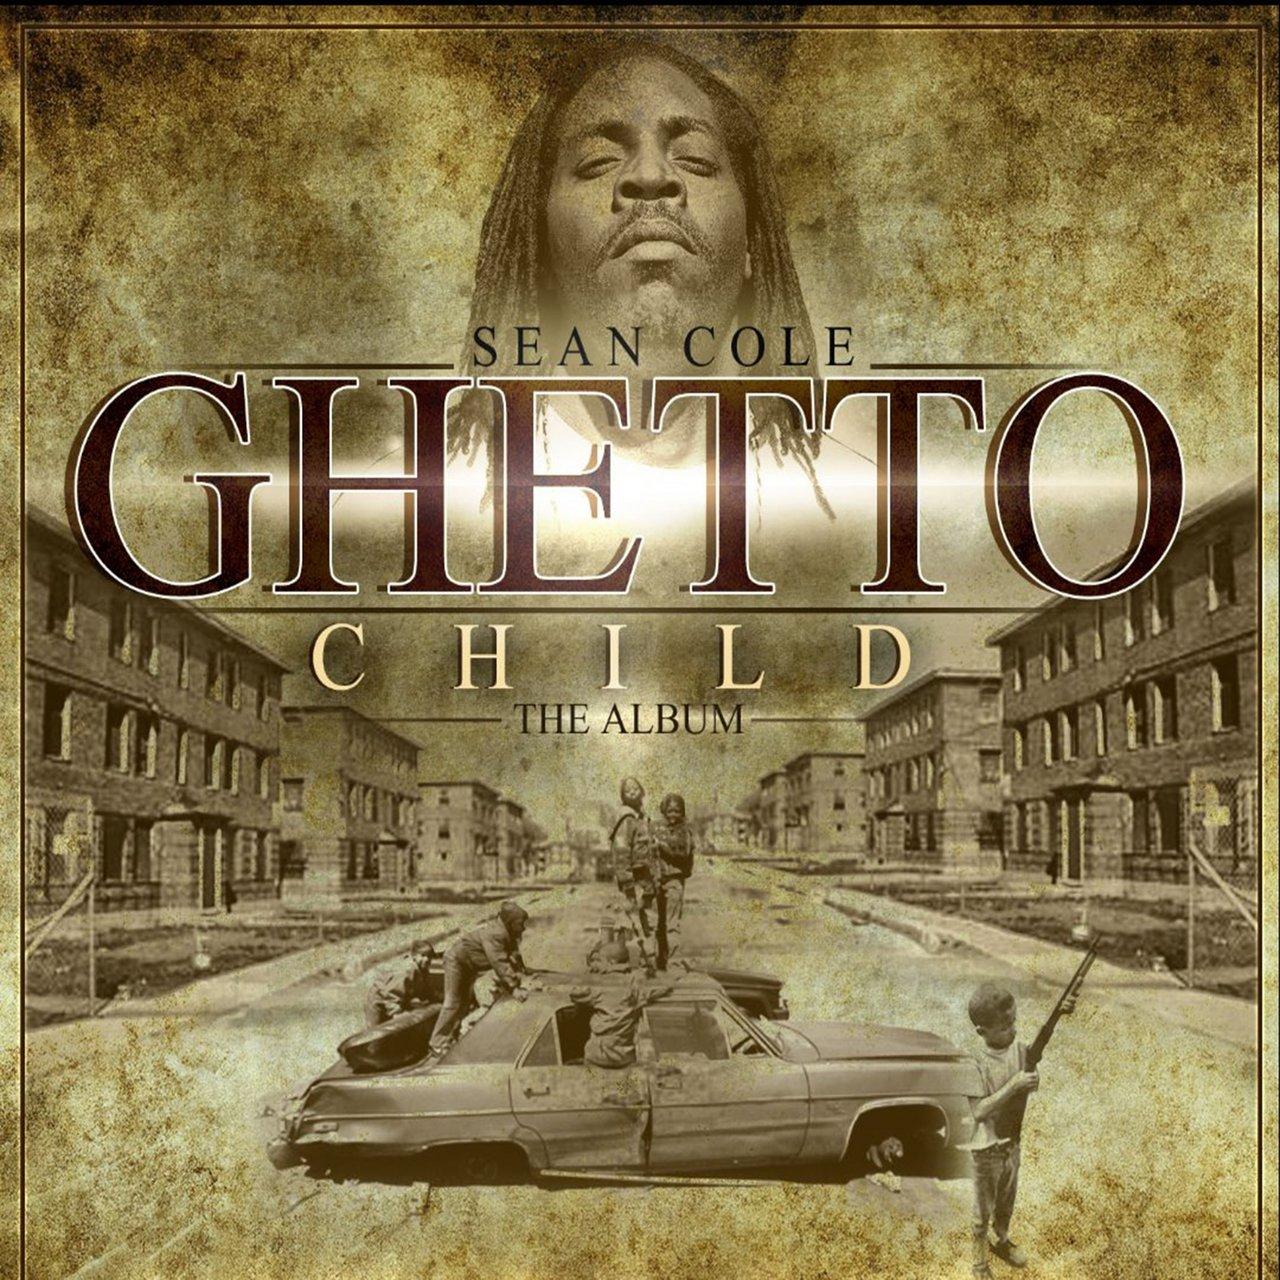 http://rap.3dn.ru/00000c/00-Sean_Cole-Ghetto_Child-front.jpg